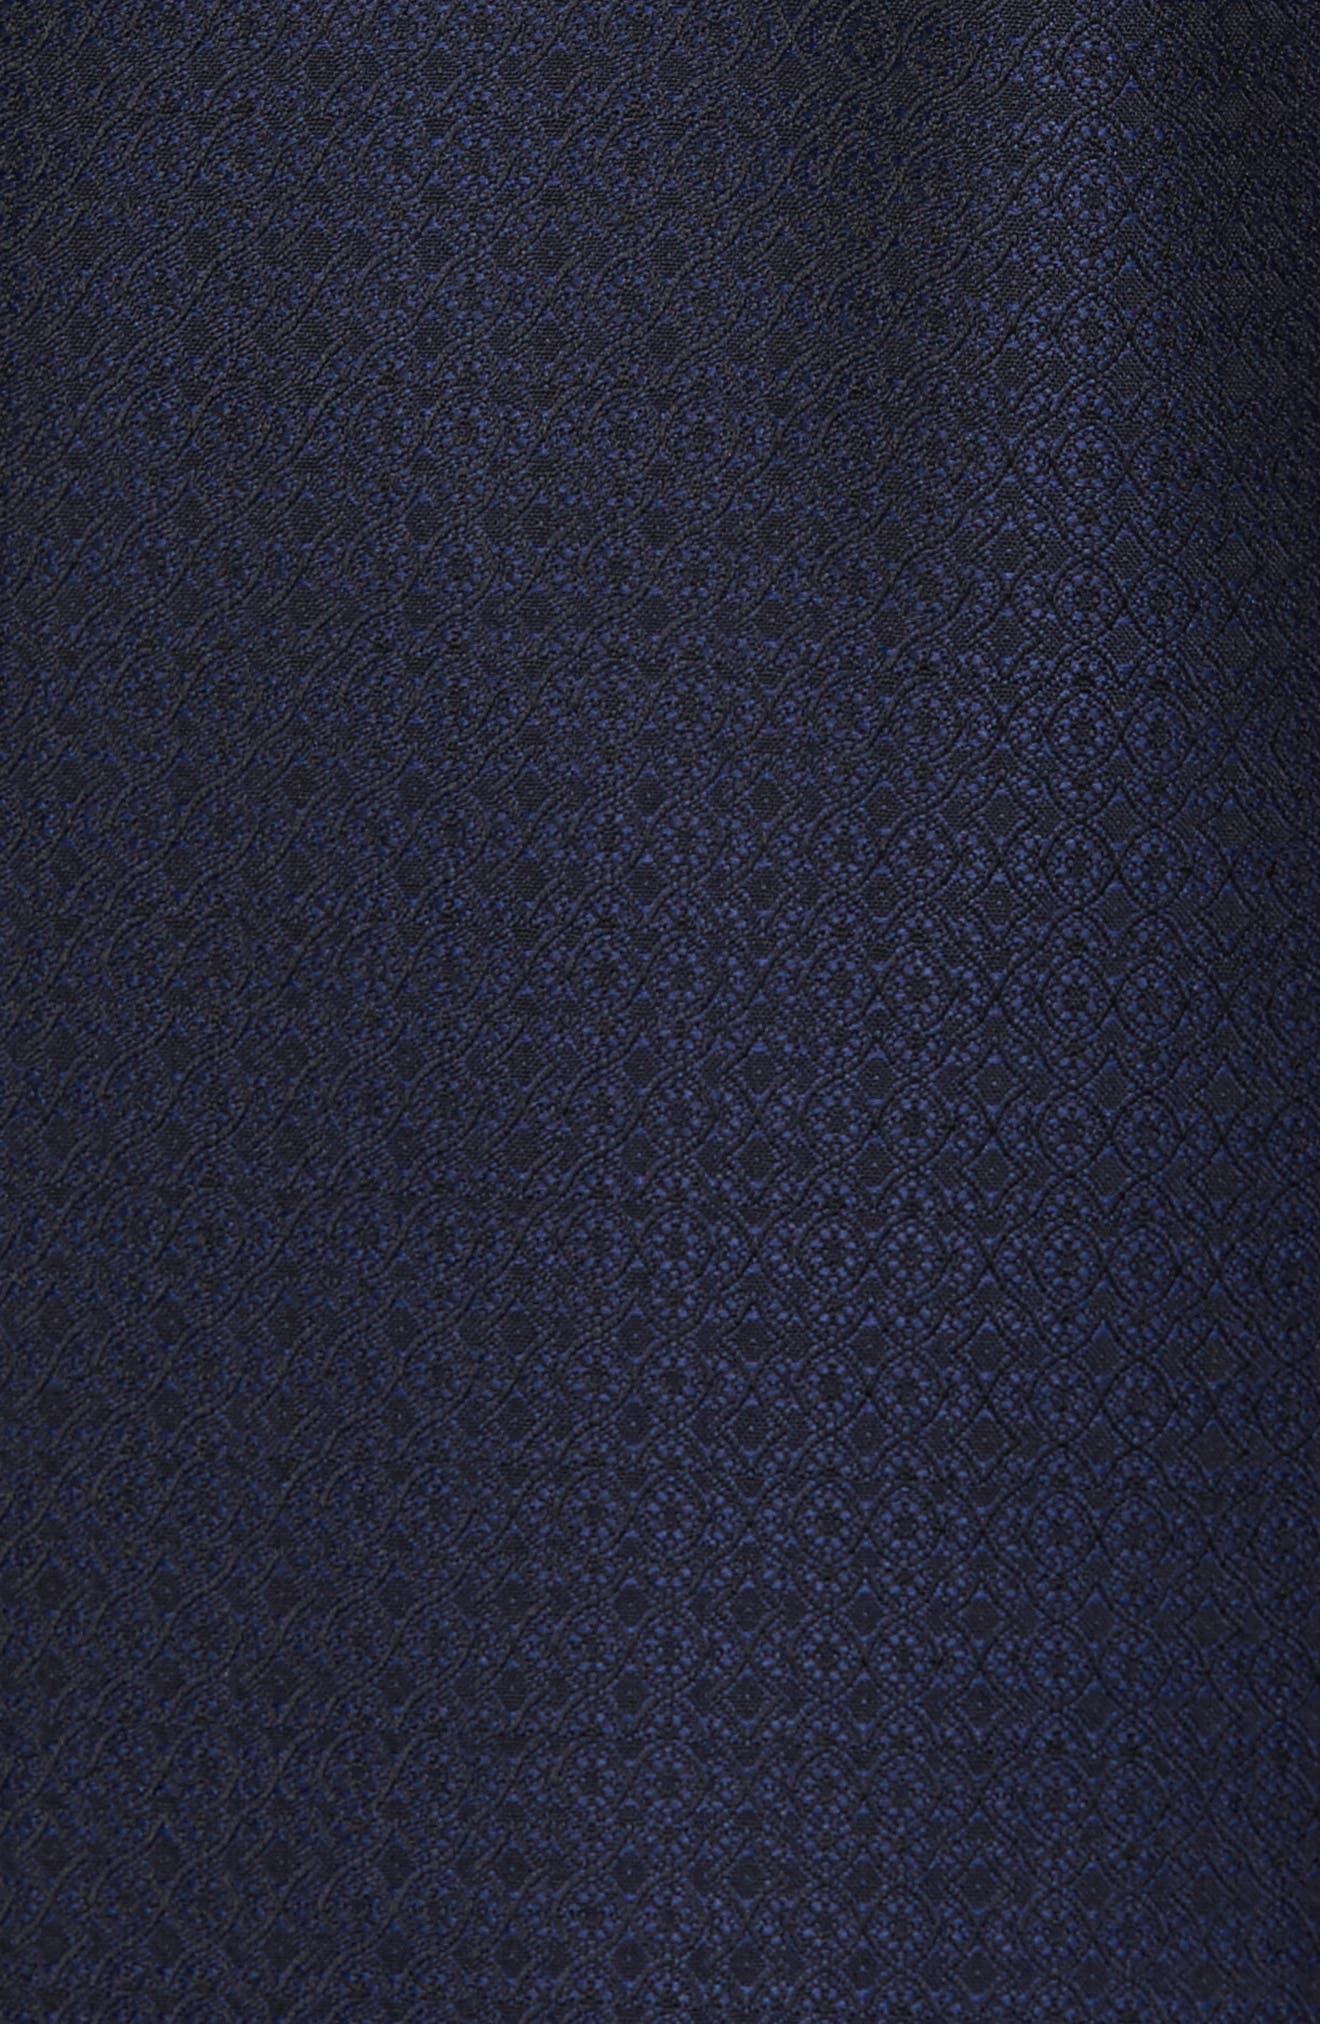 Jack Trim Fit Wool Dinner Jacket,                             Alternate thumbnail 6, color,                             400